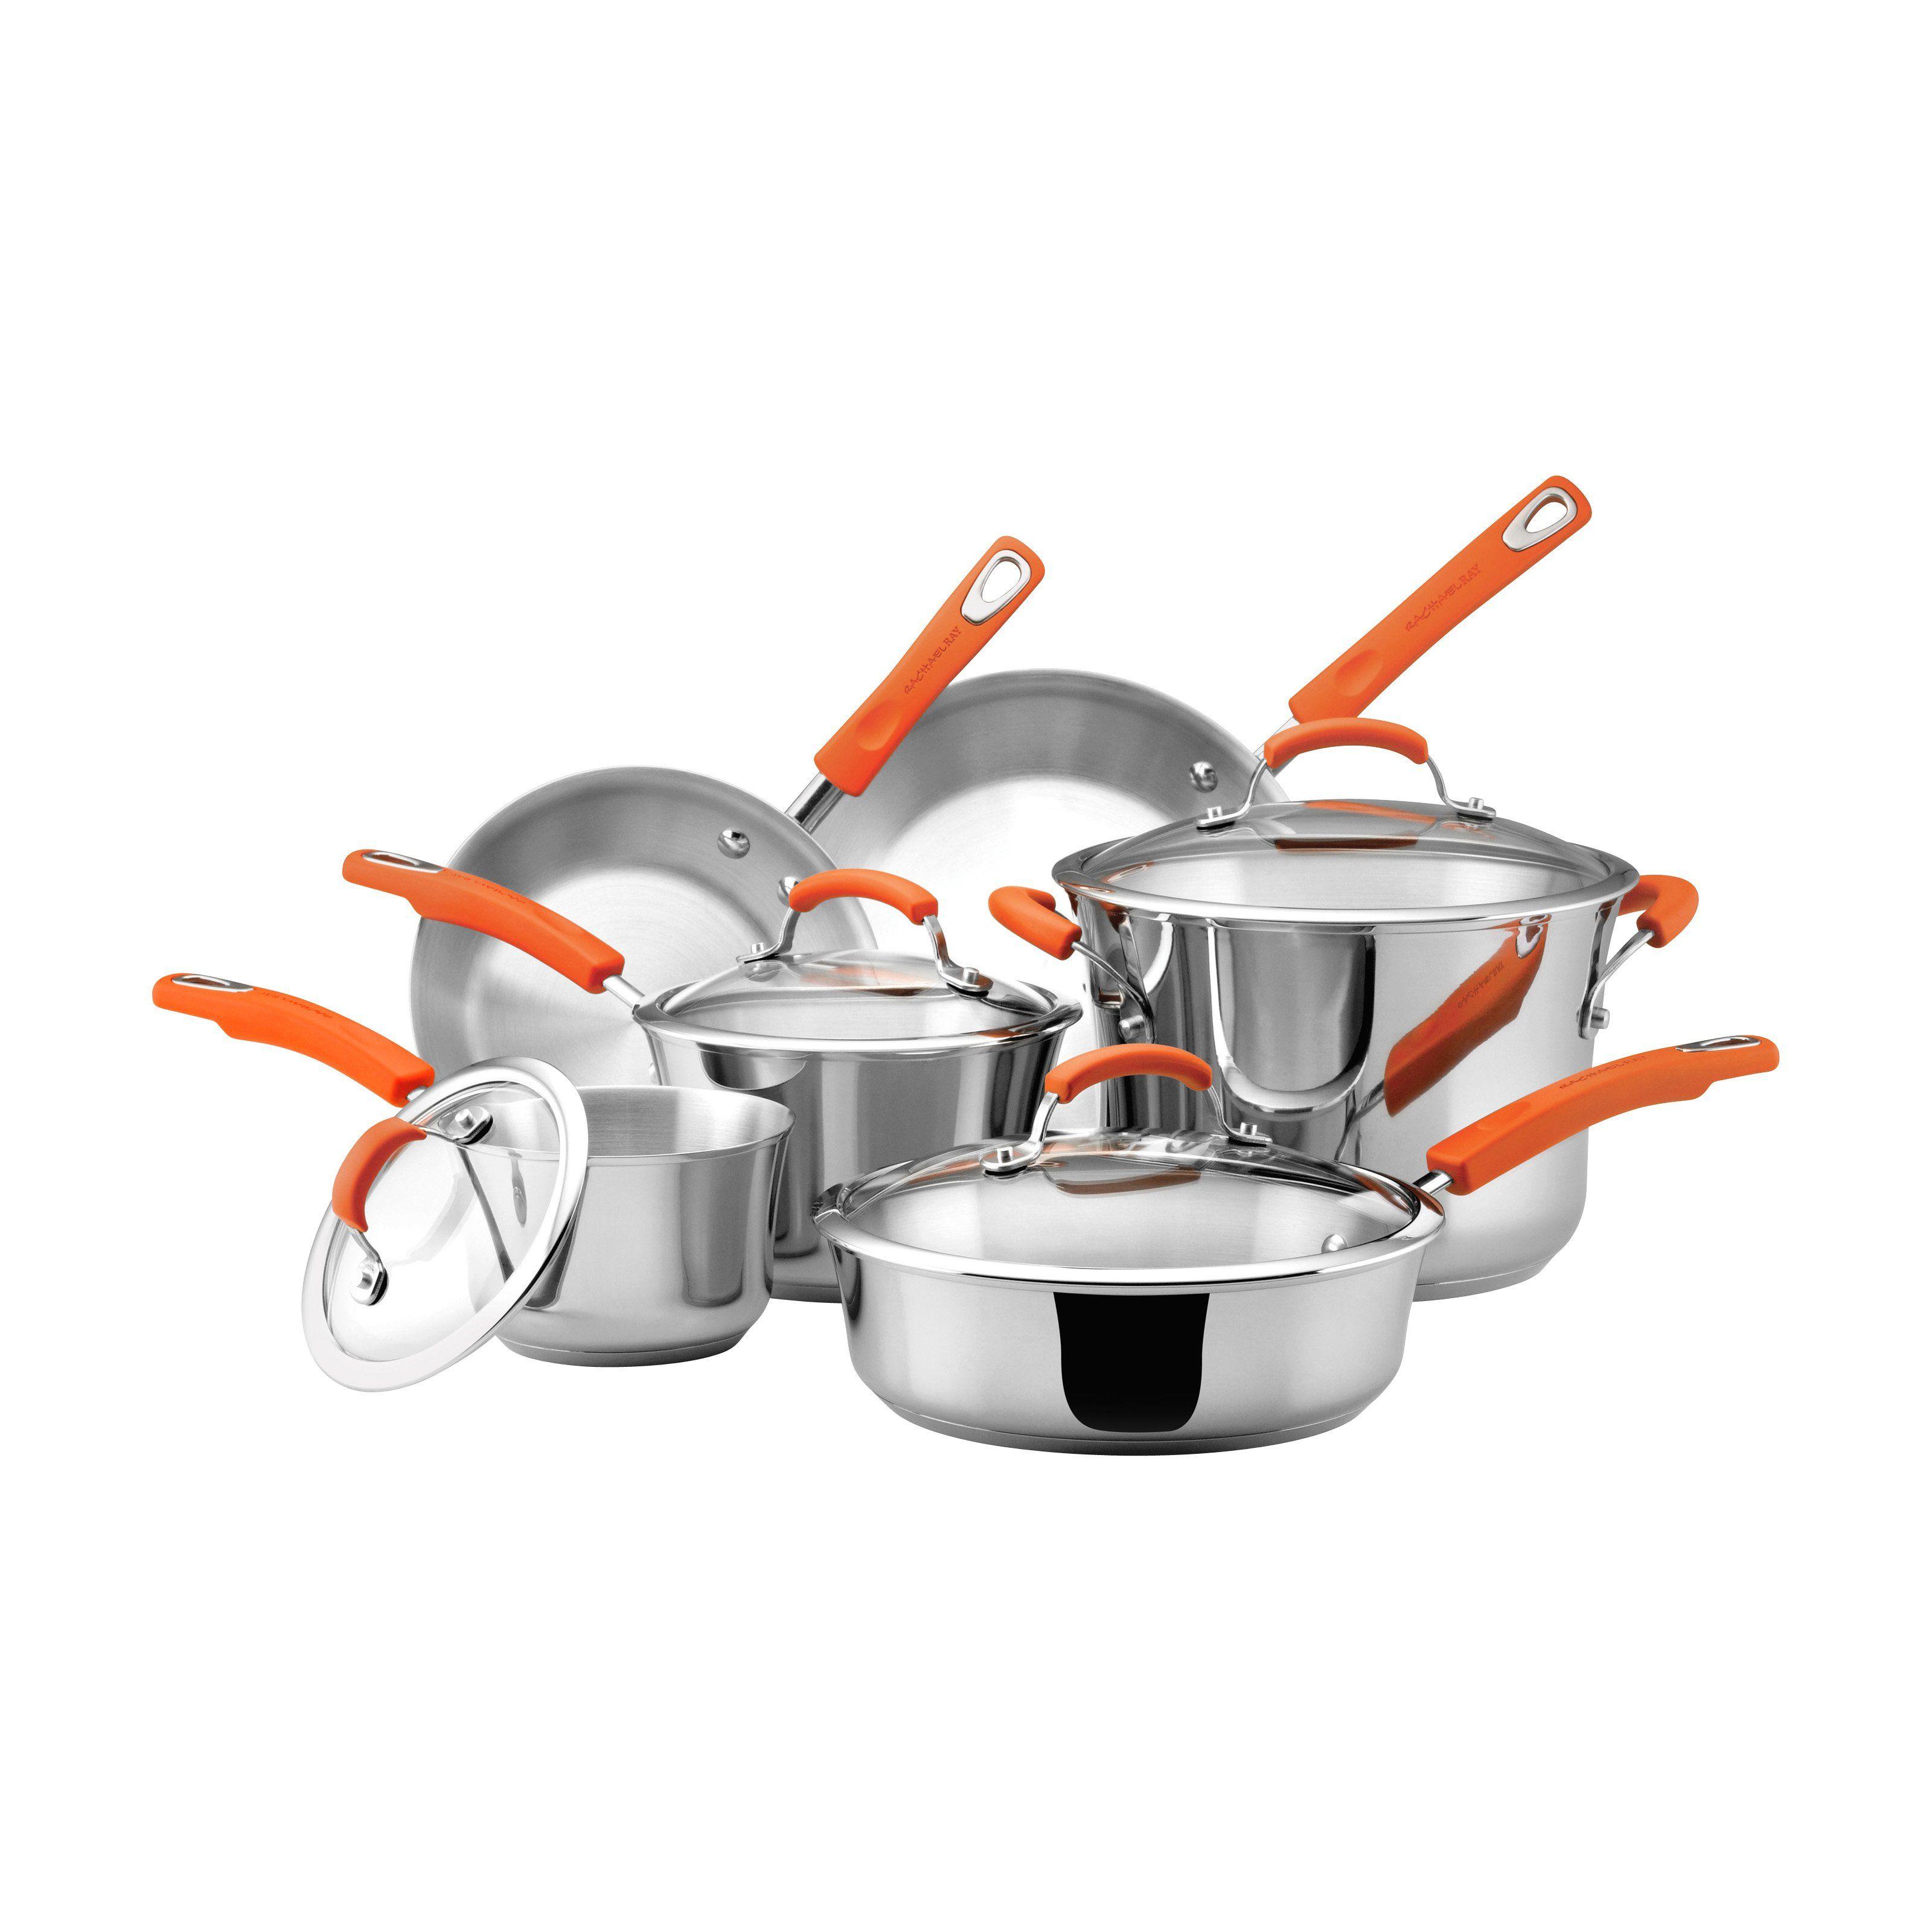 Rachael Ray Stainless Steel Ii 10 Piece Nonstick Cookware Set